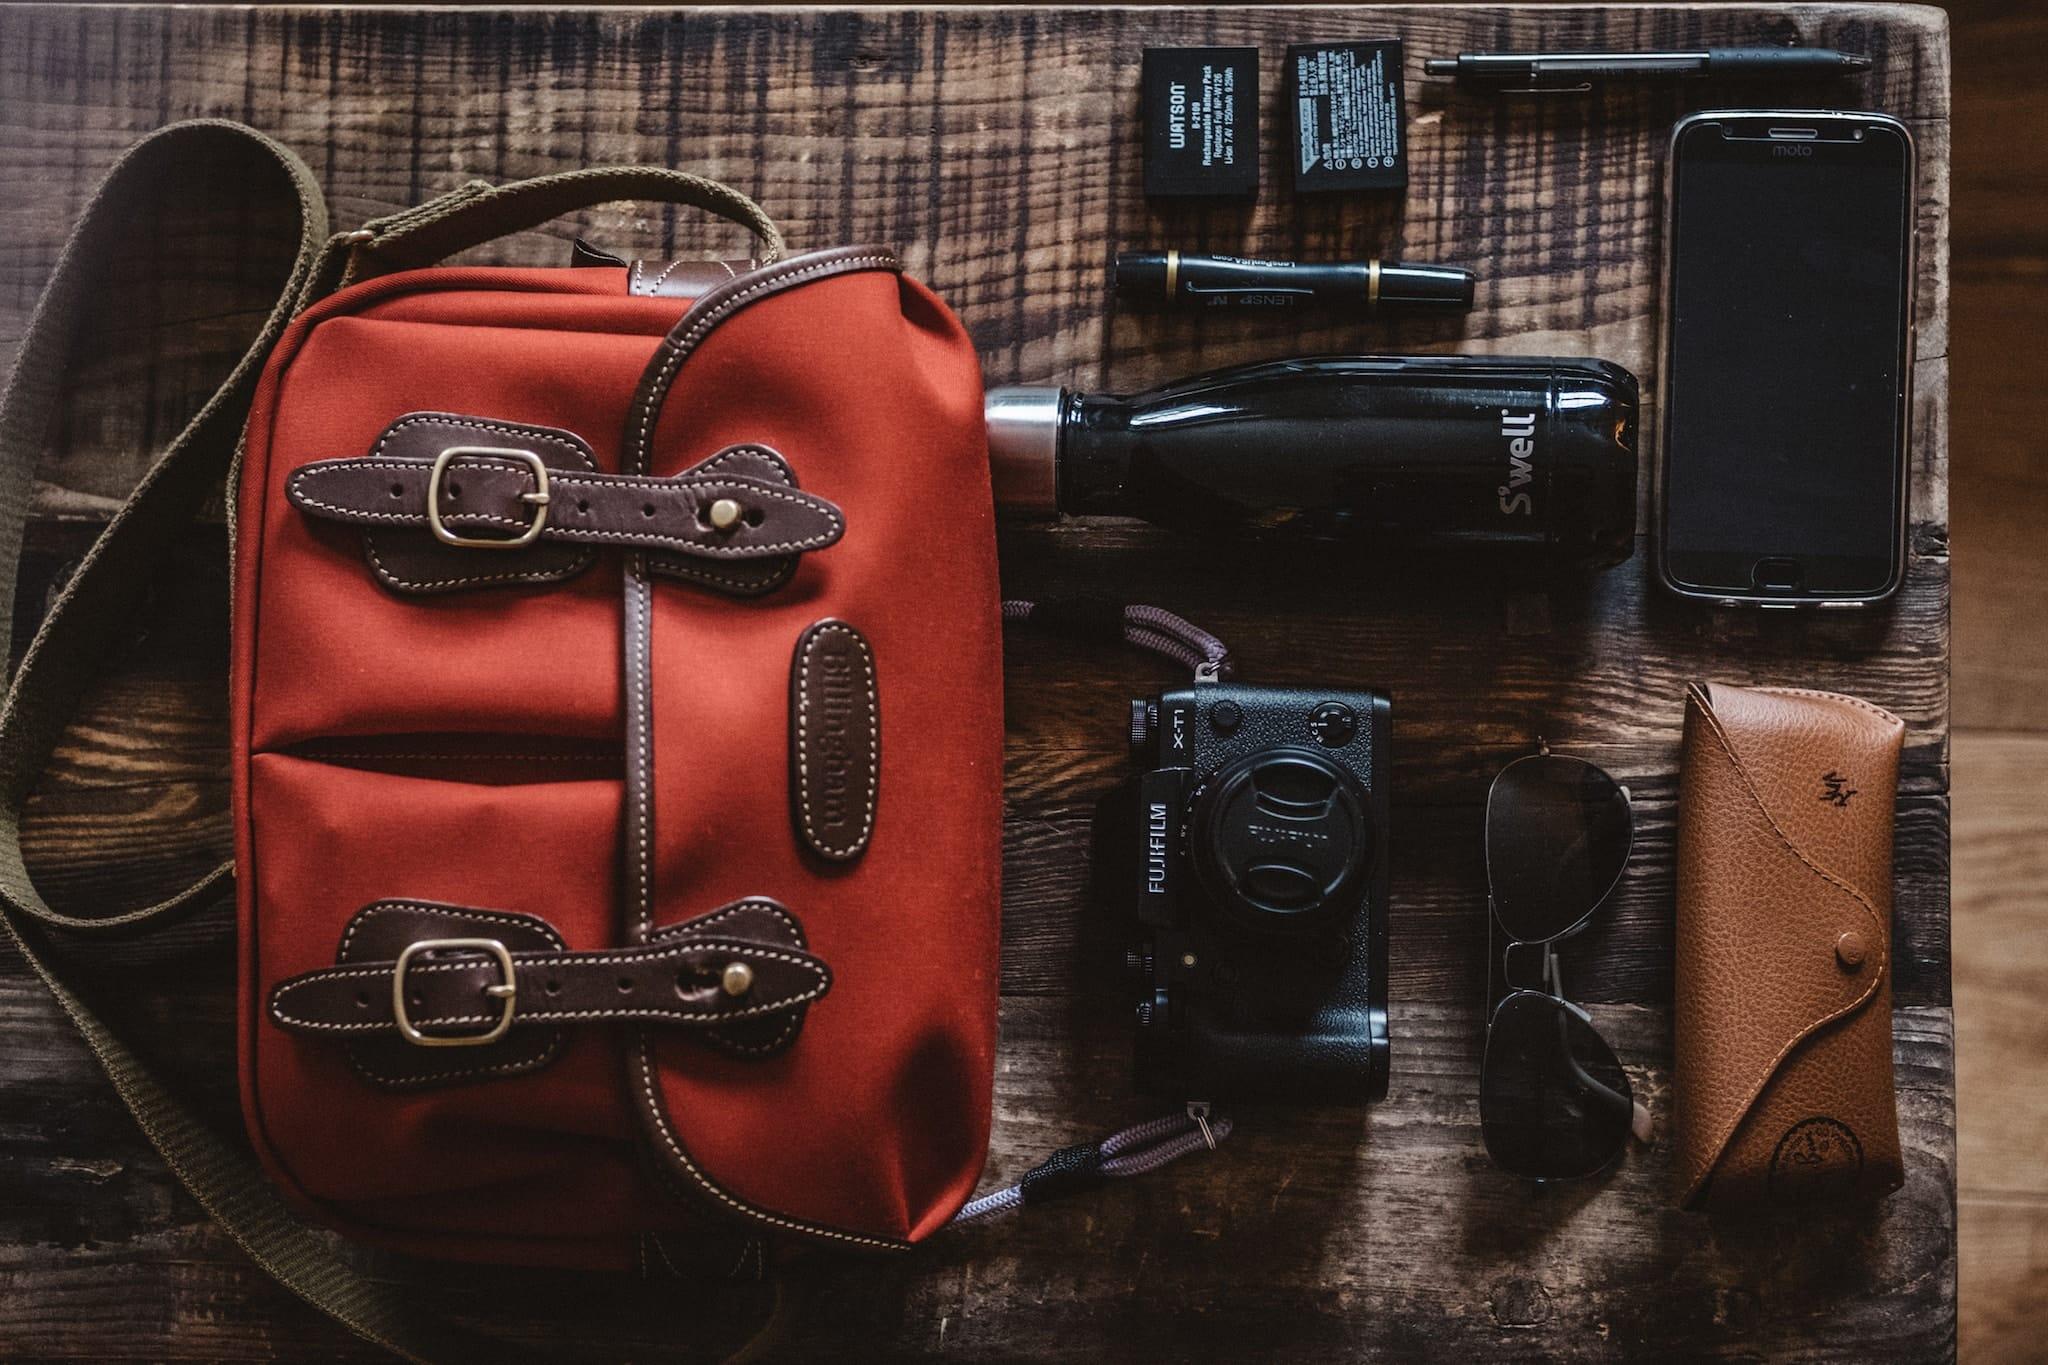 Marcelo de Coghlan's Camera Bag - Bag No. 151